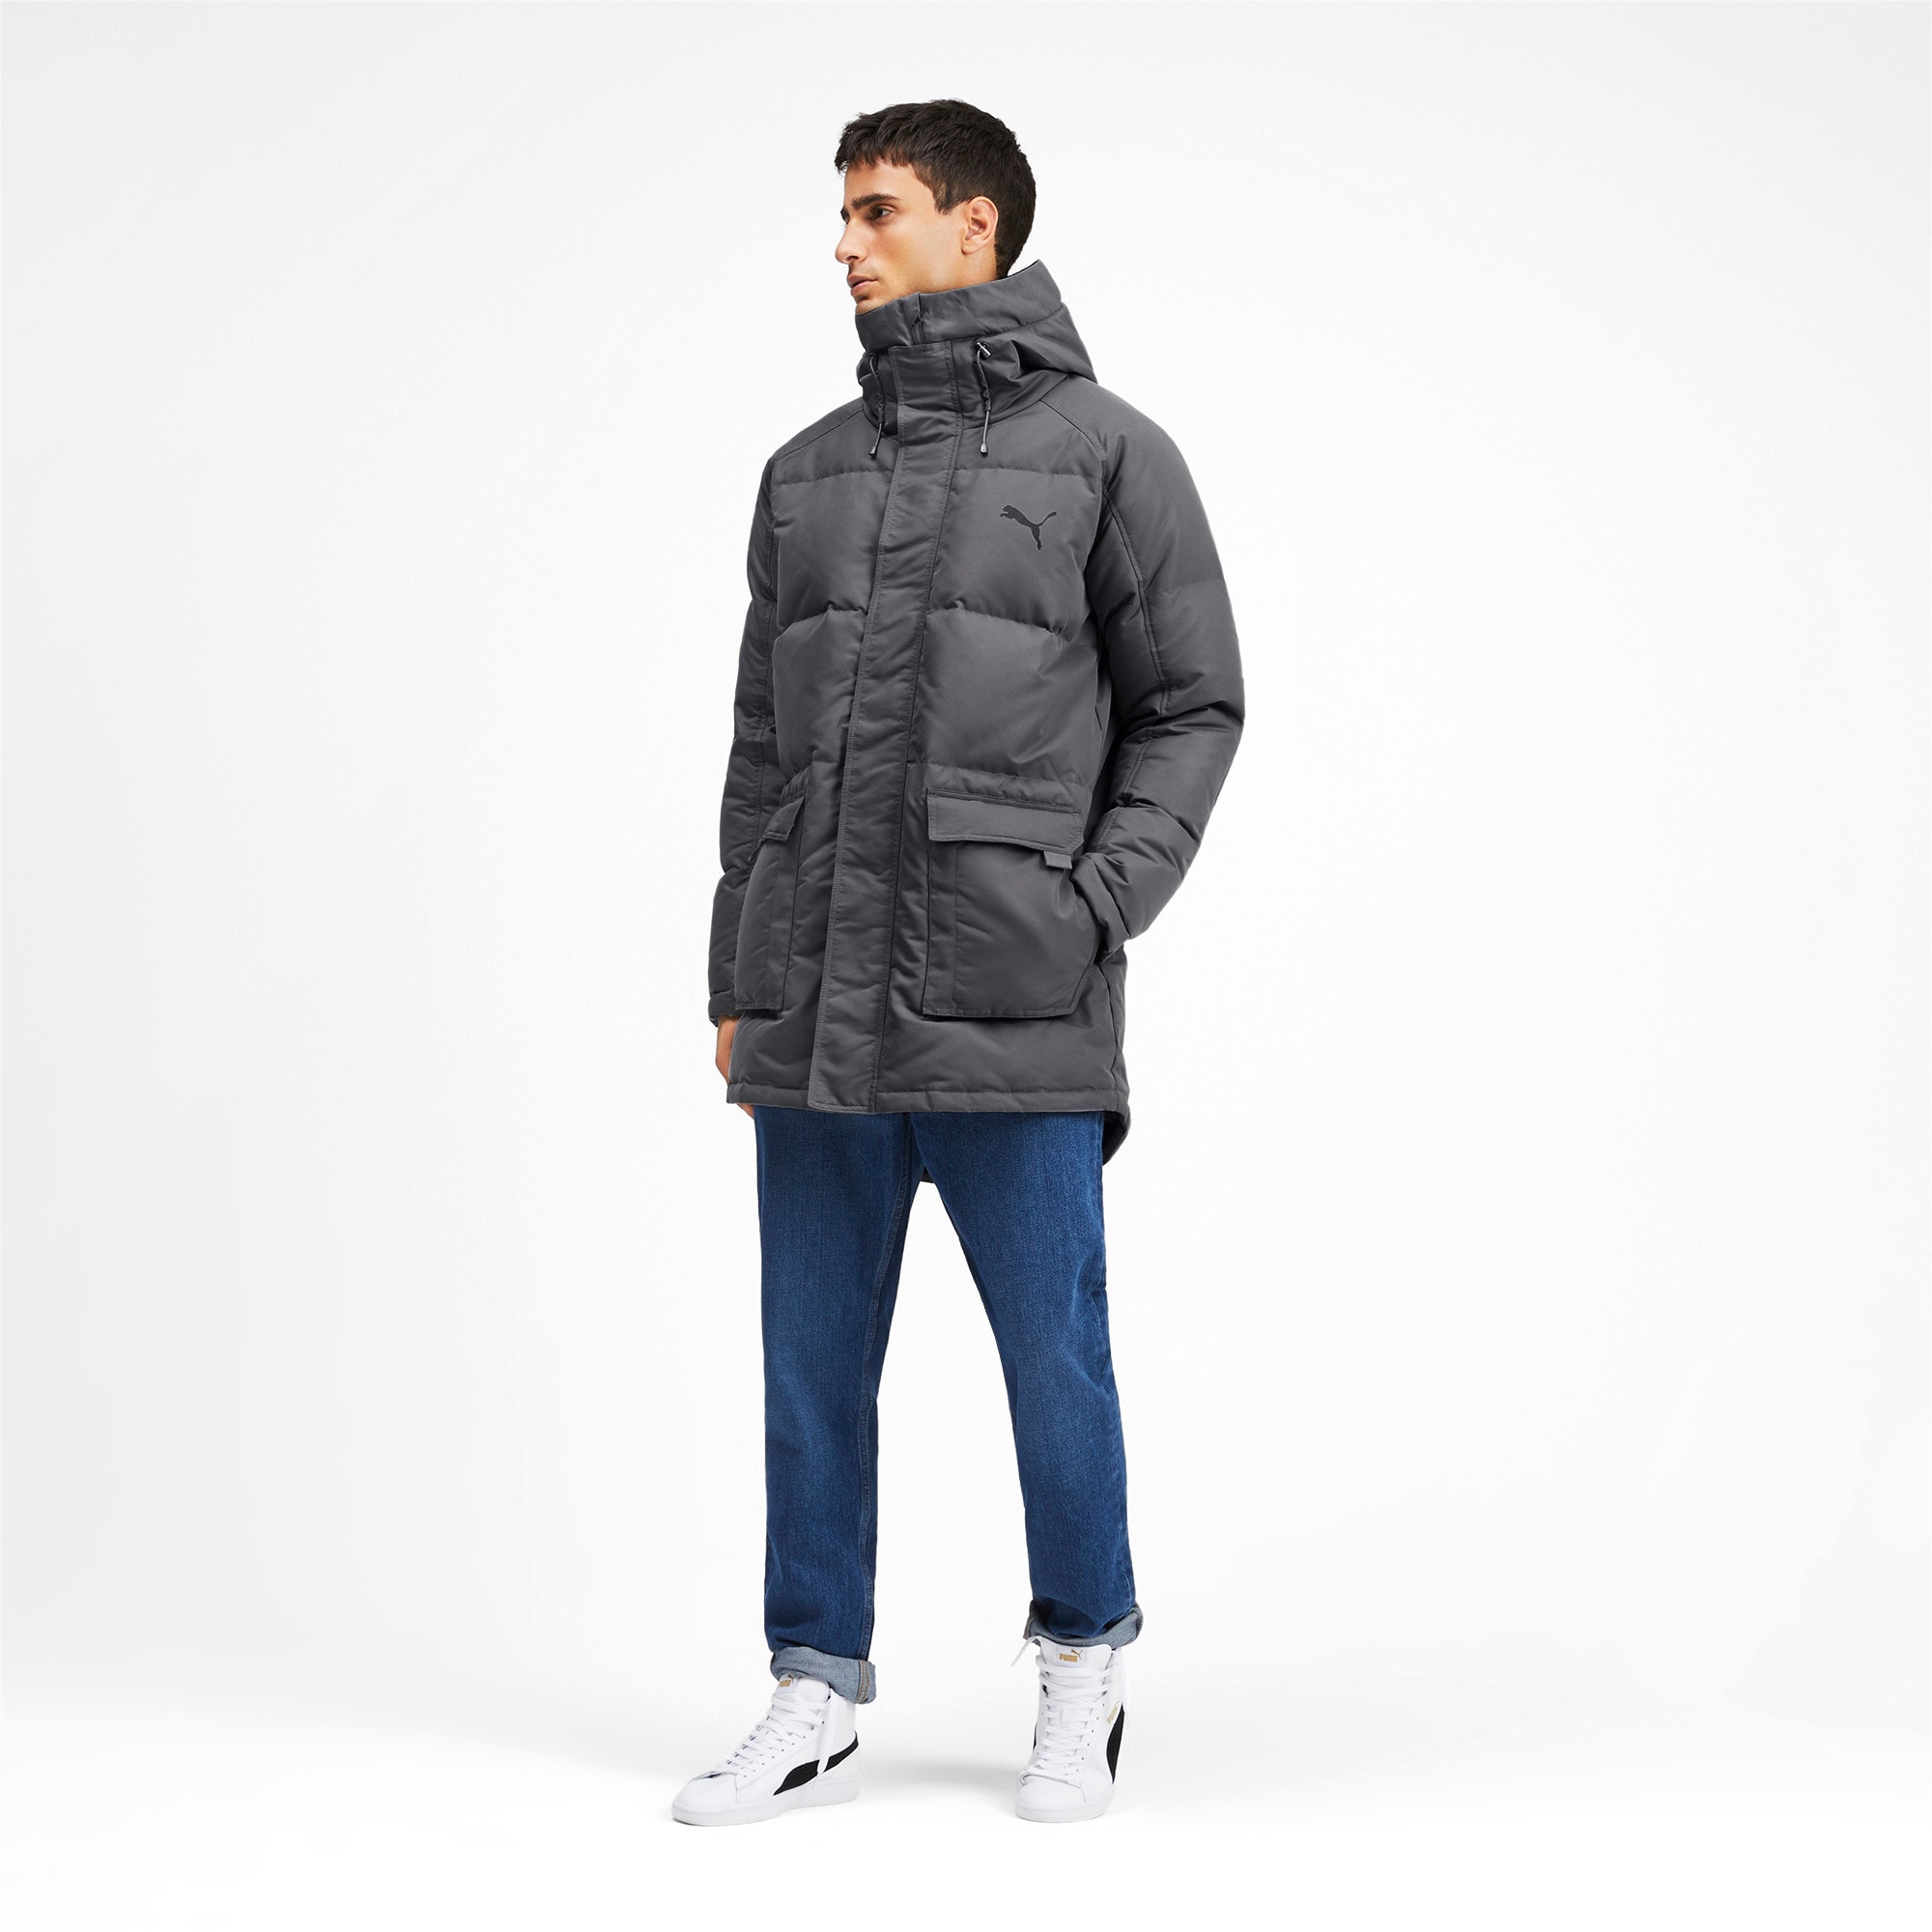 Thumbnail 3 of Oversize 500 Down Hooded Men's Jacket, CASTLEROCK, medium